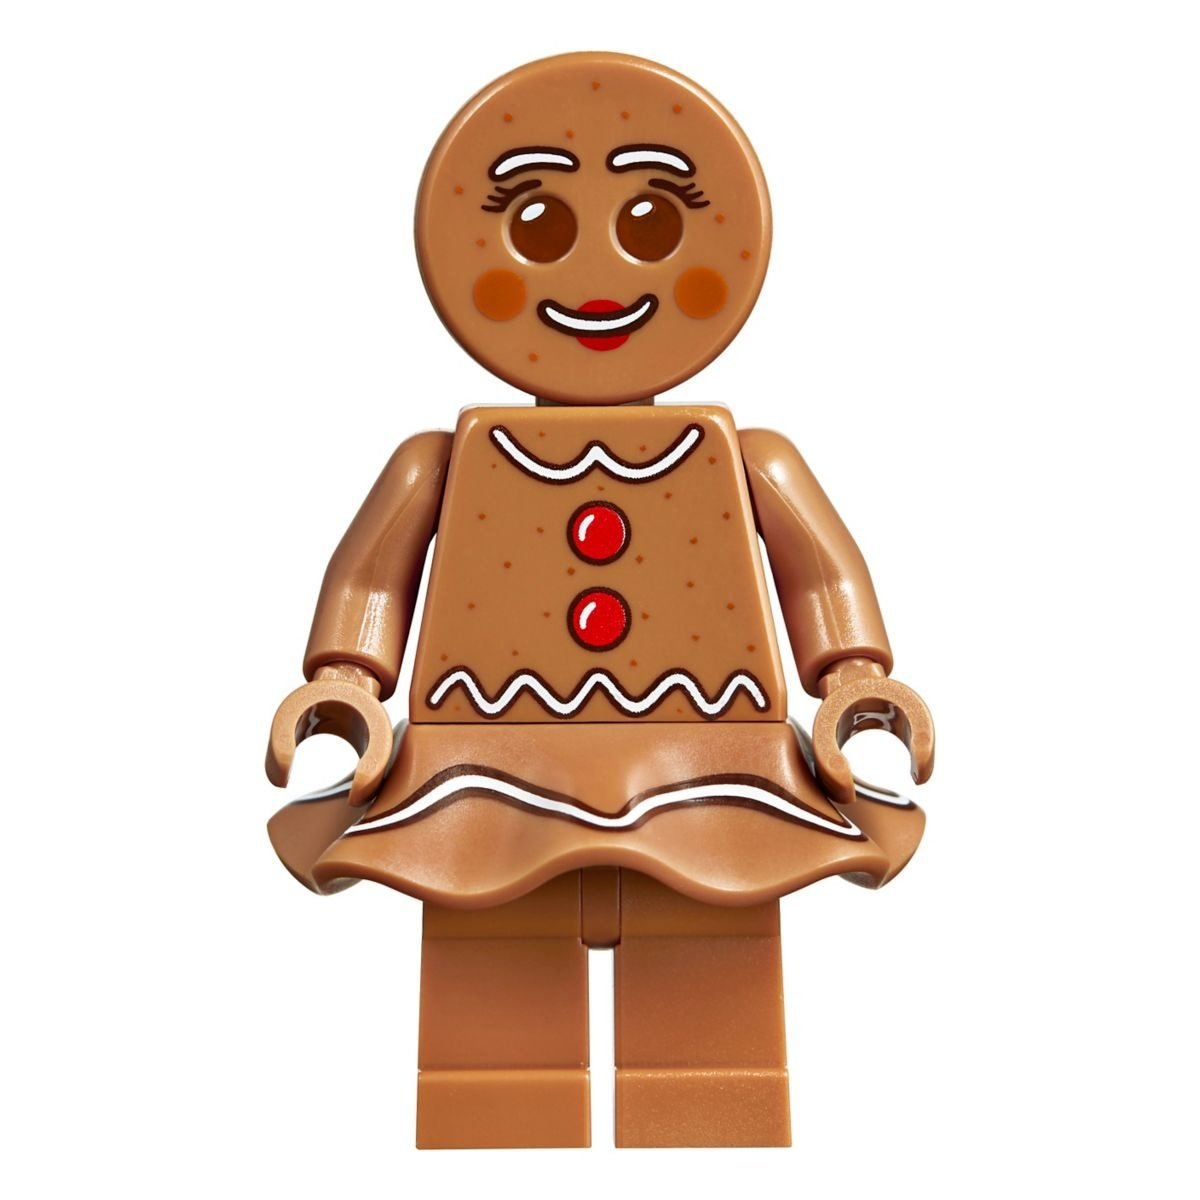 lego-creator-expert-10267-gingerbreadhouse-0021